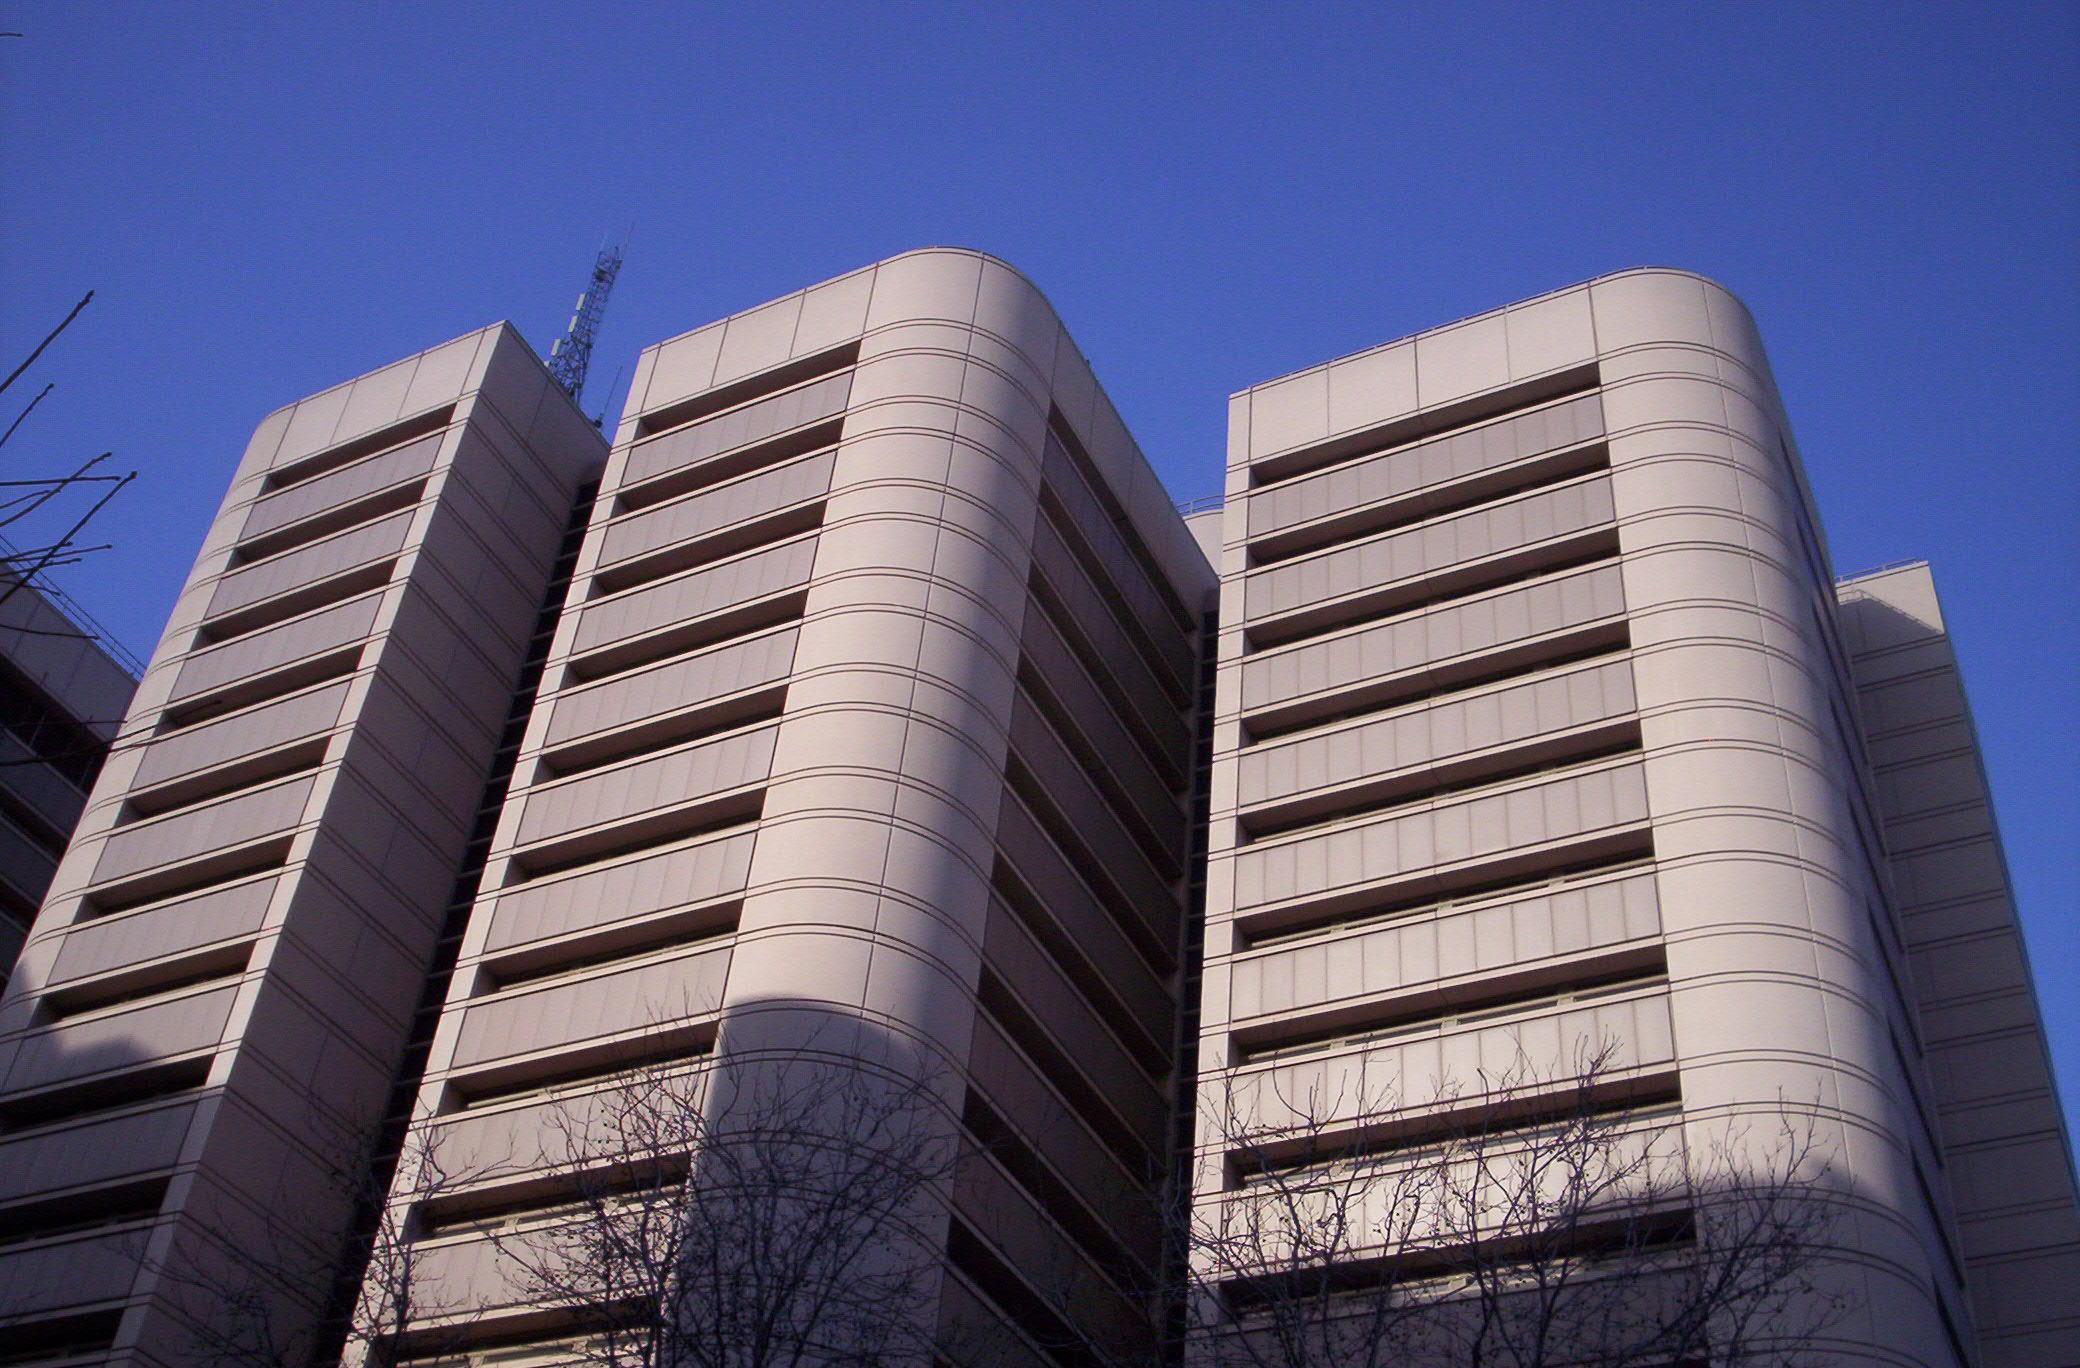 Sacramento County Jail - Wikipedia